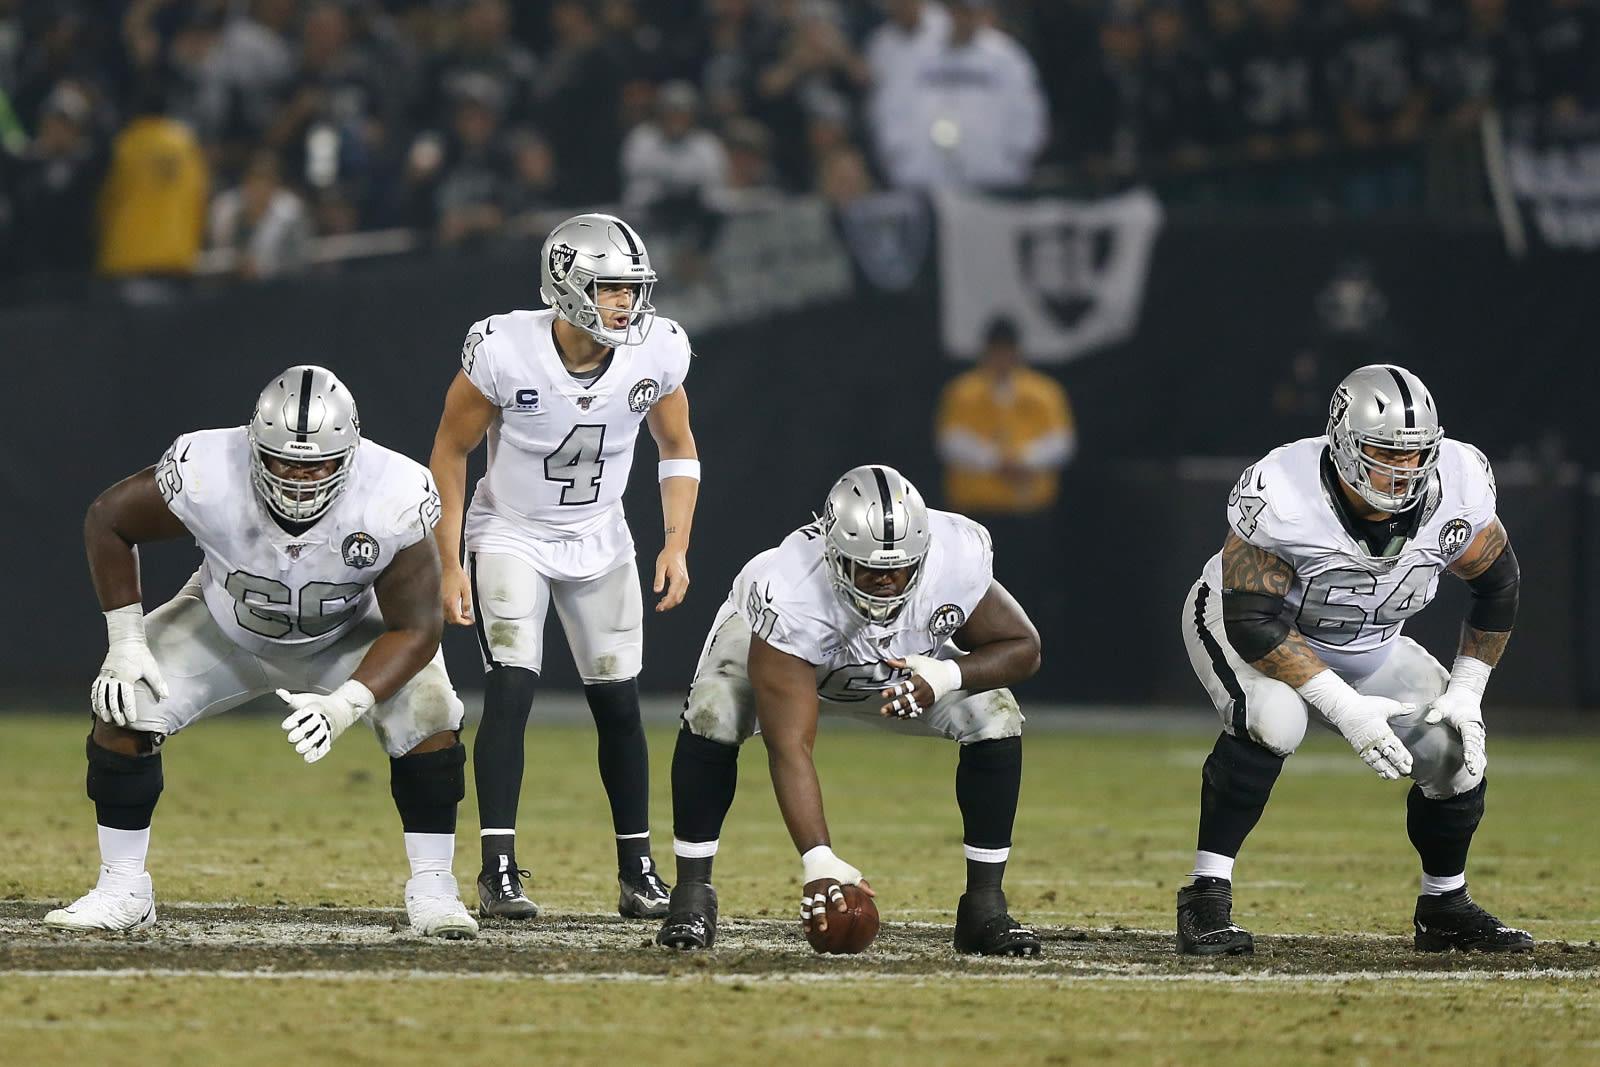 Raiders offensive line